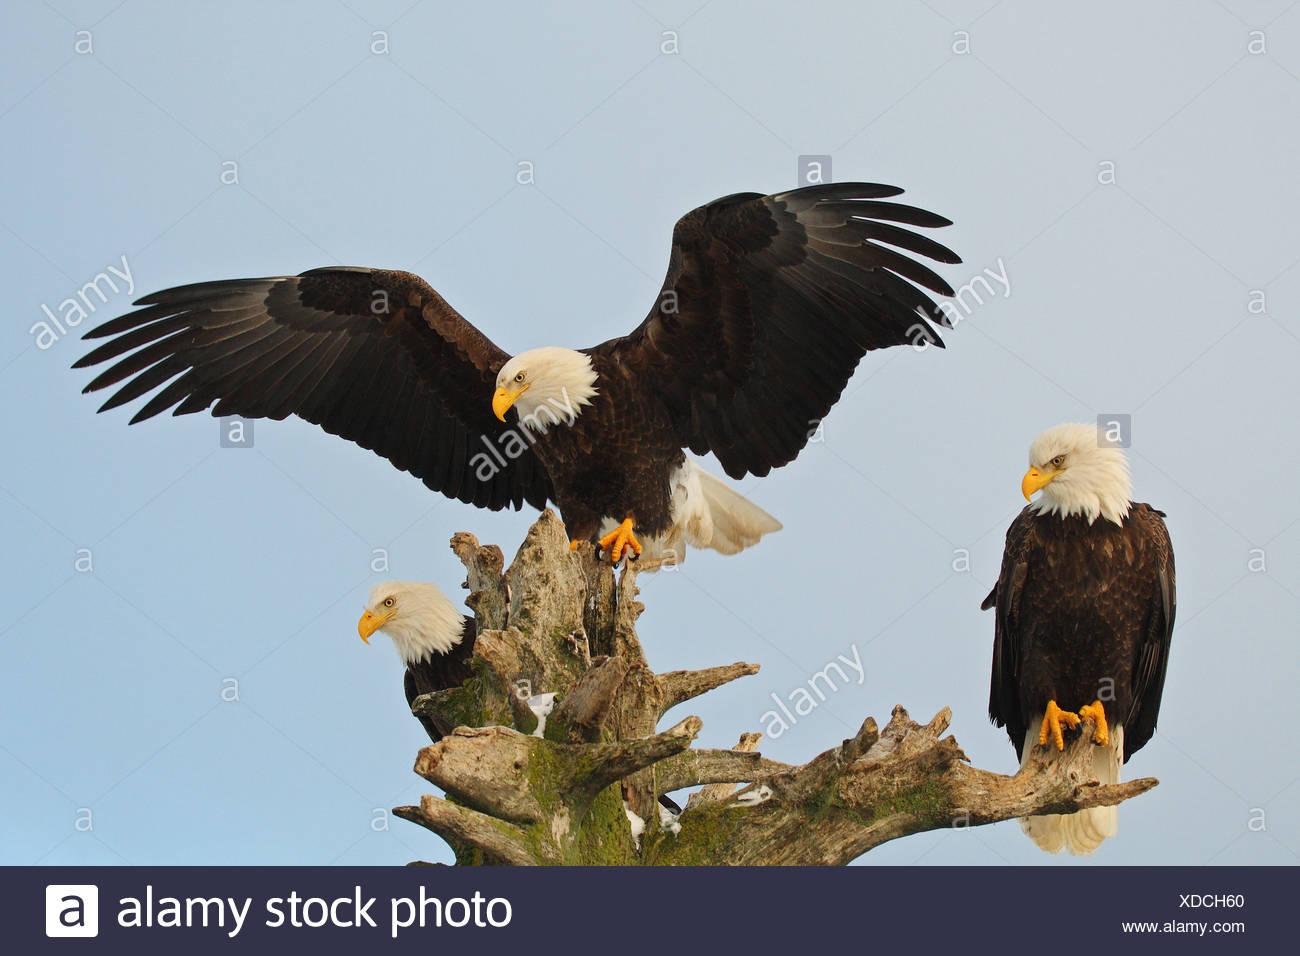 three Bald eagles / Haliaeetus leucocephalus - Stock Image